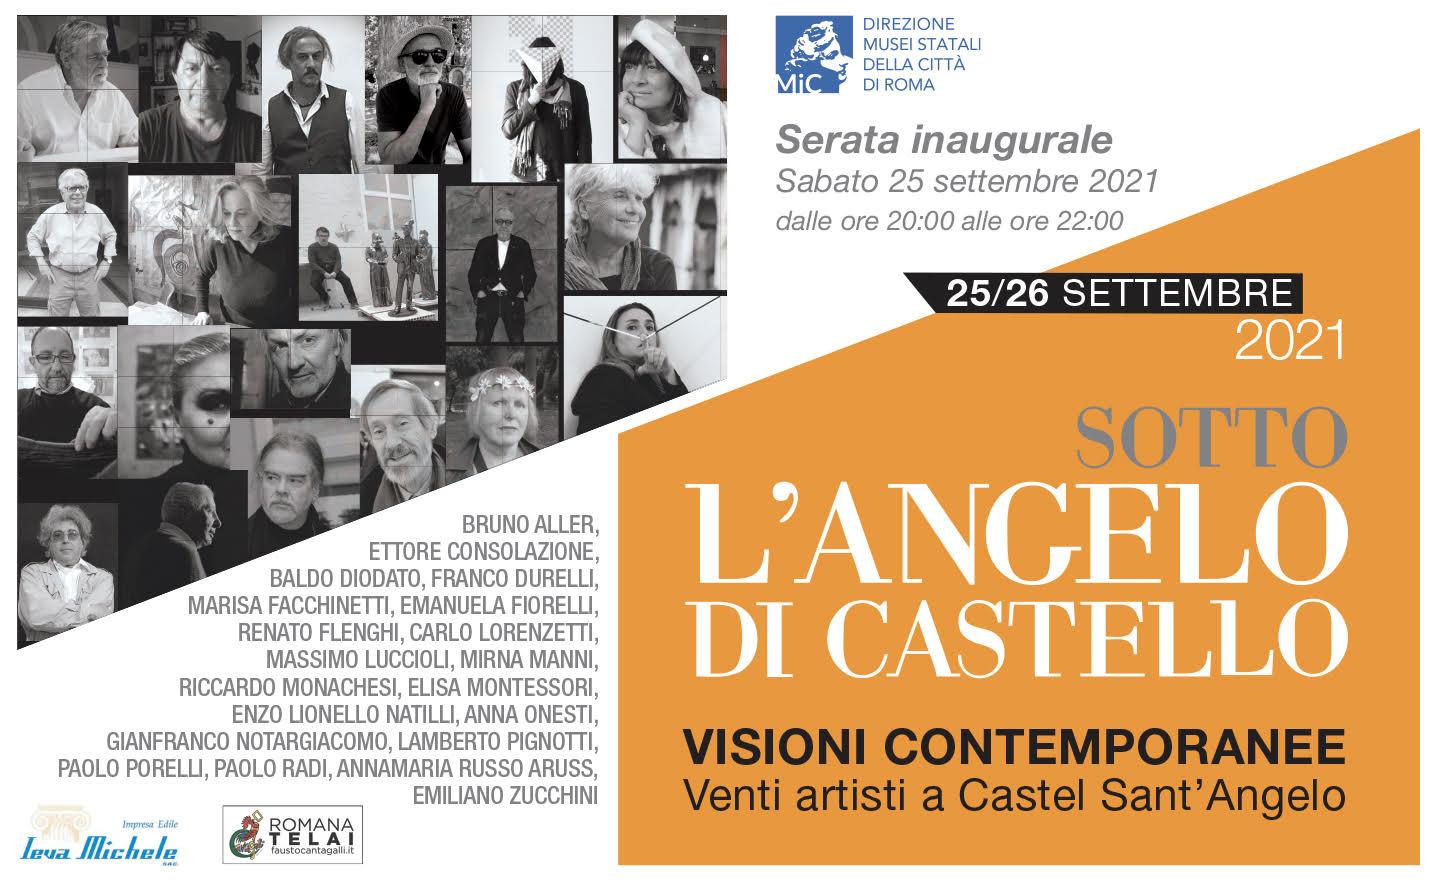 Visioni contemporanee a Castel Sant'Angelo